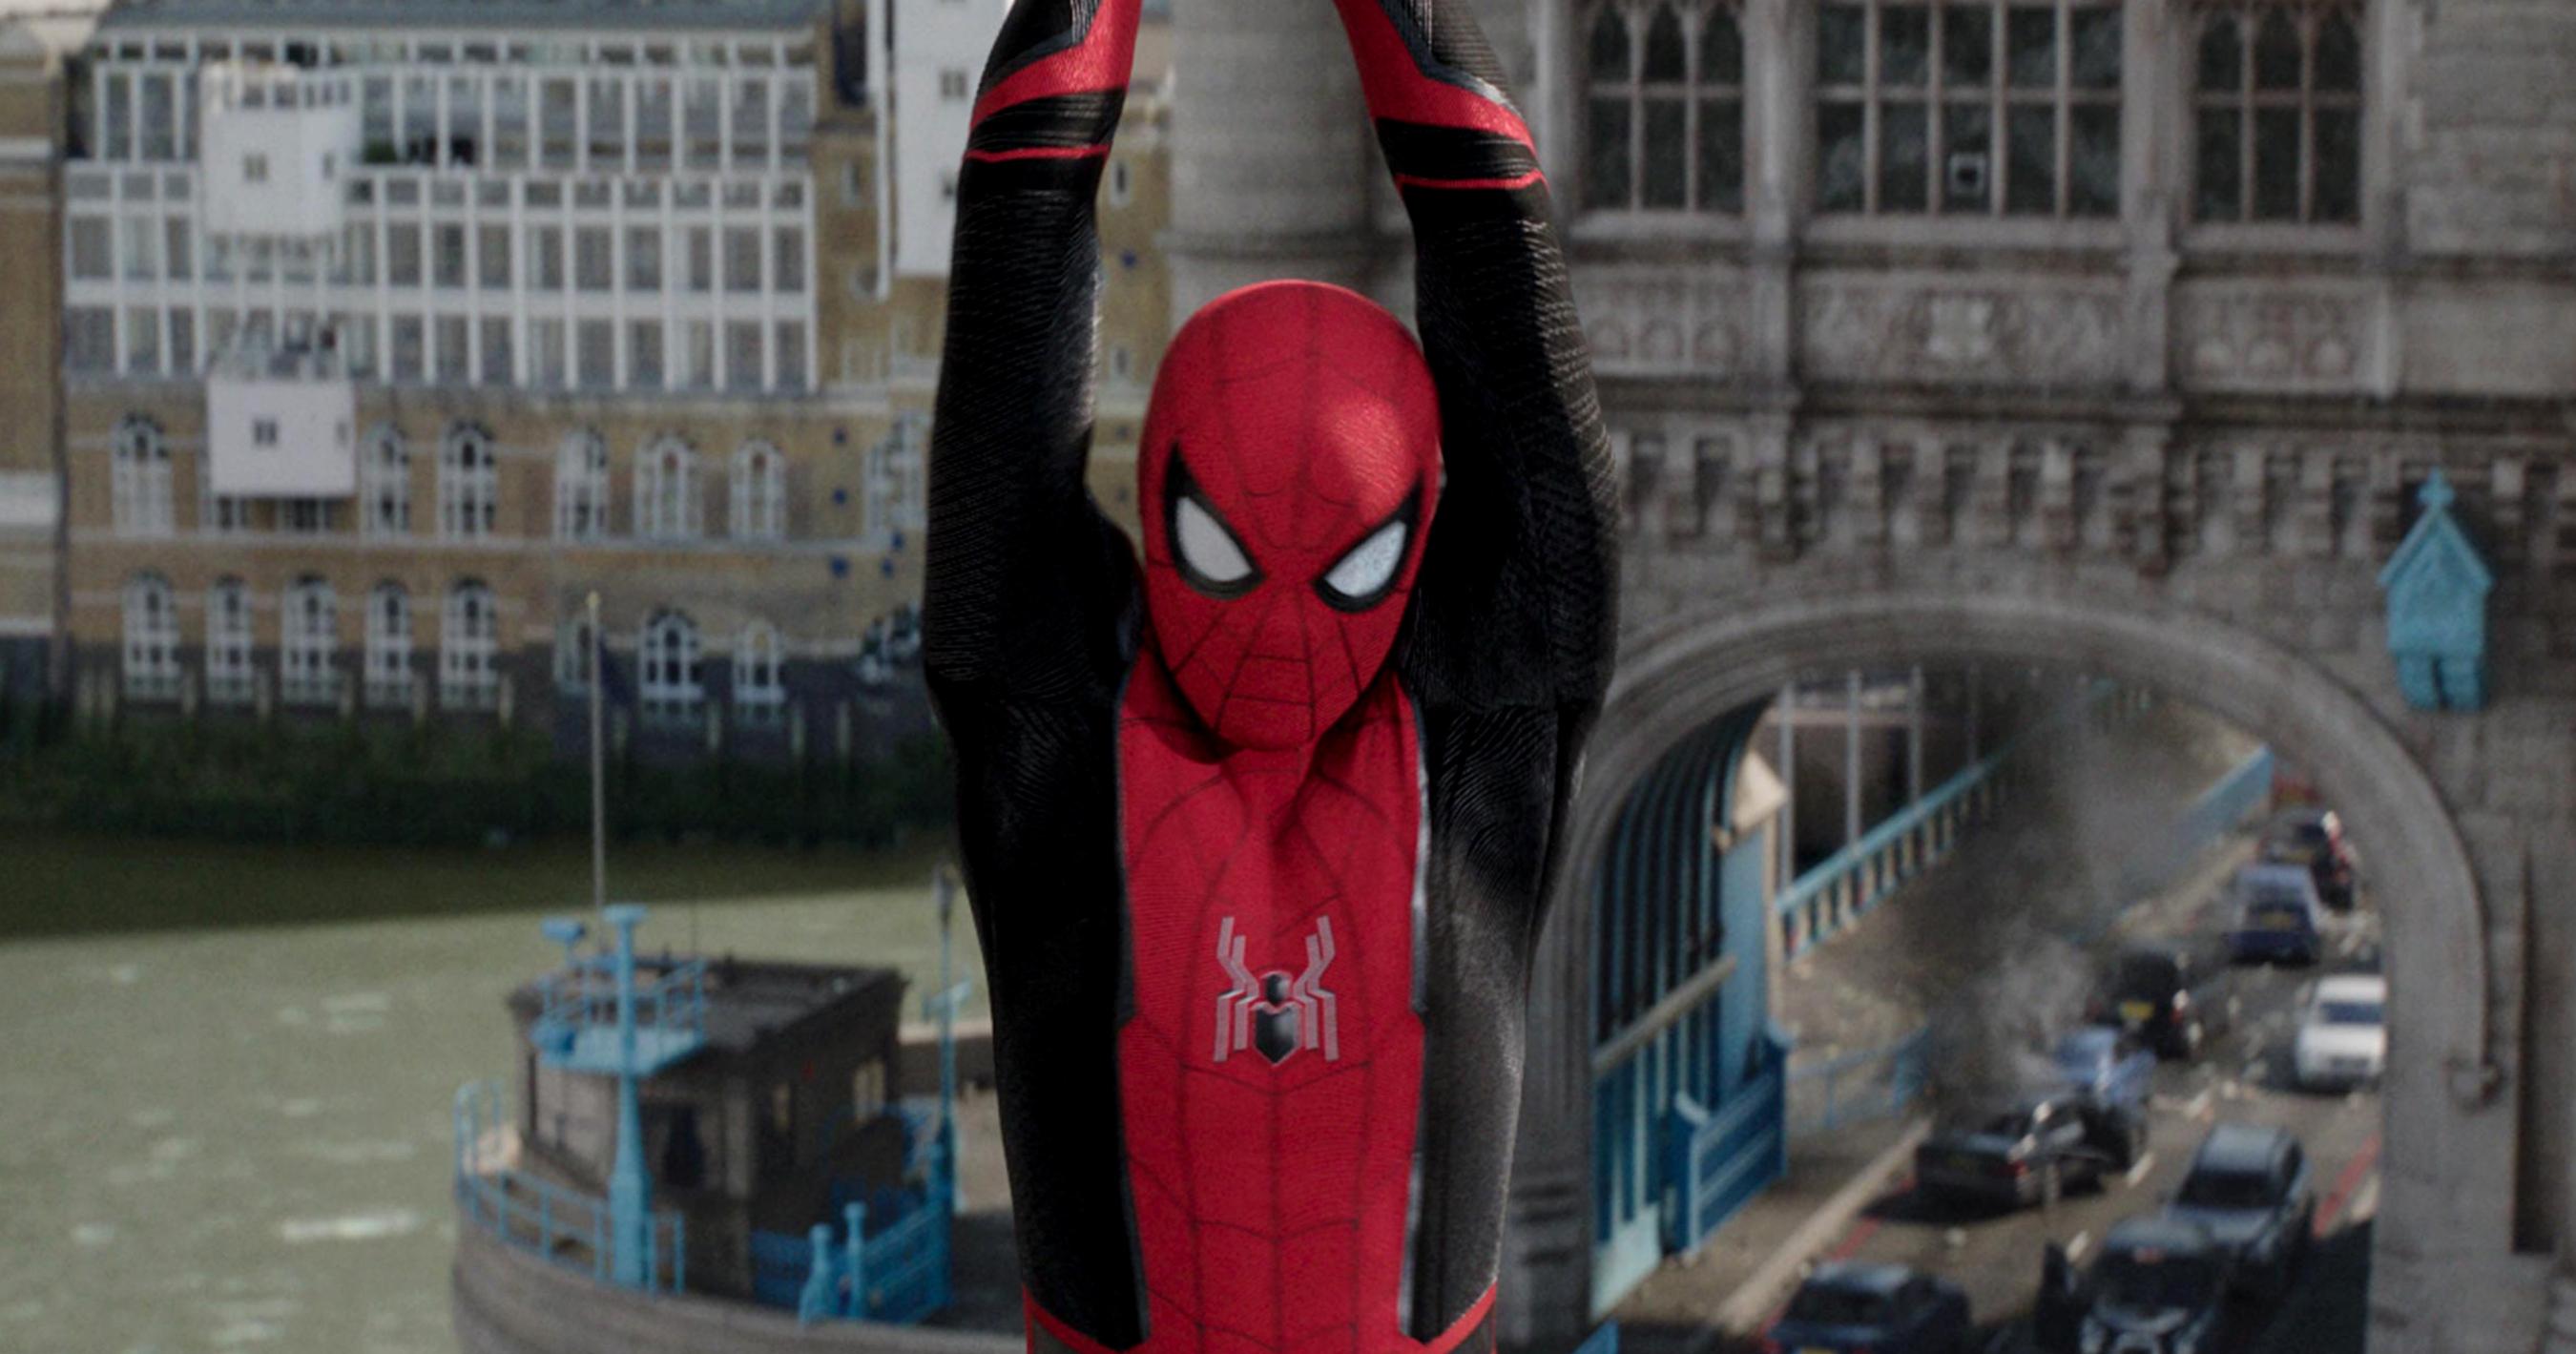 spider-man-far-from-home-bfb4520_trlcomp_v222_1022_1.jpg